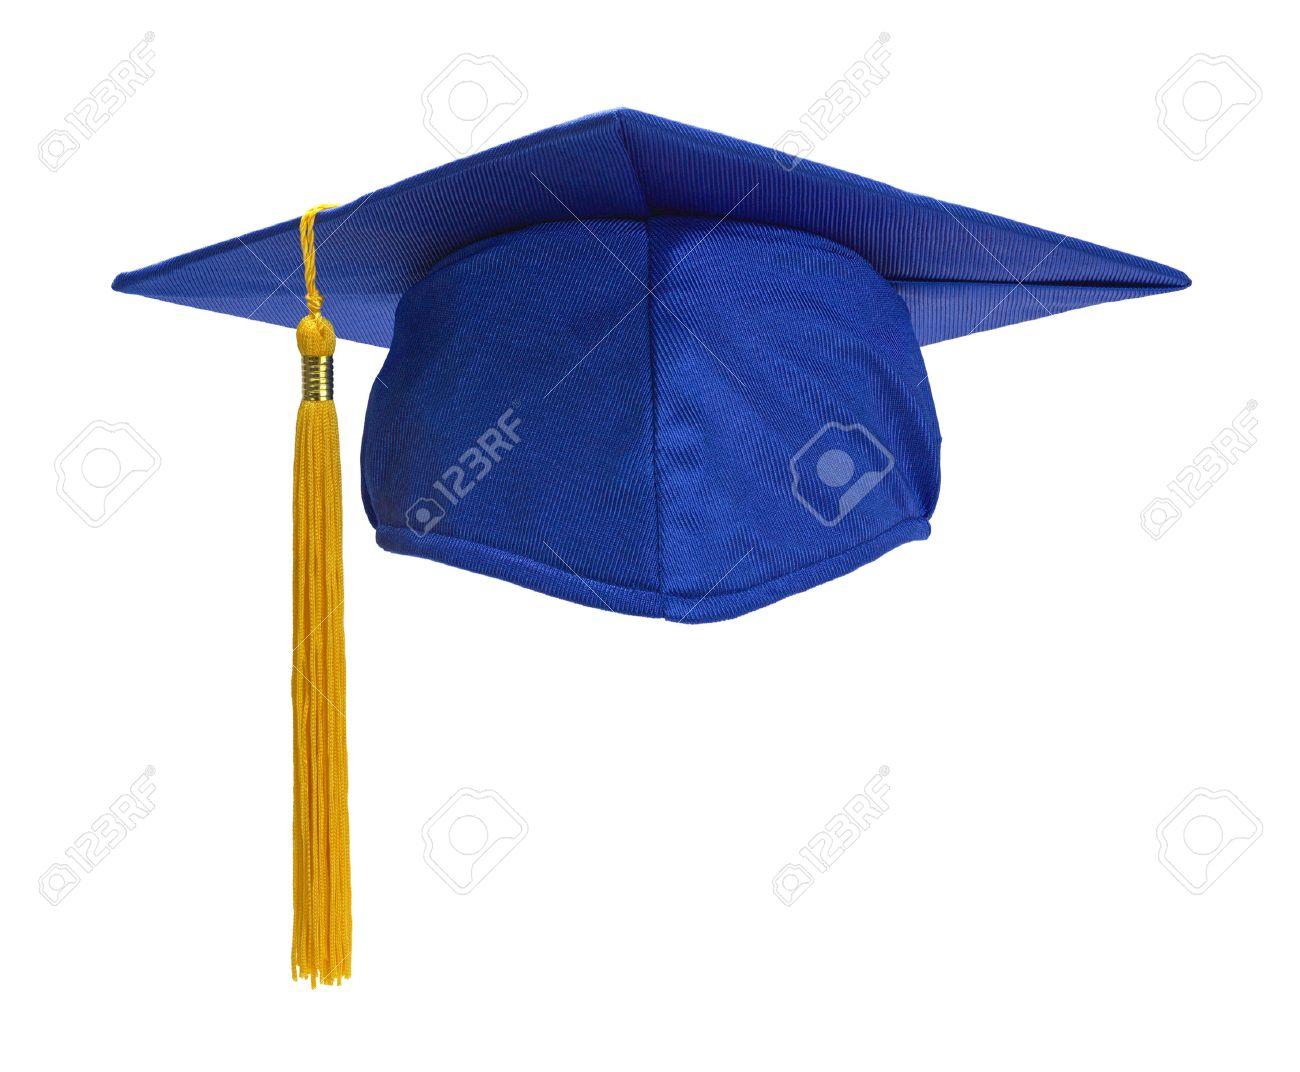 blue graduation hat with